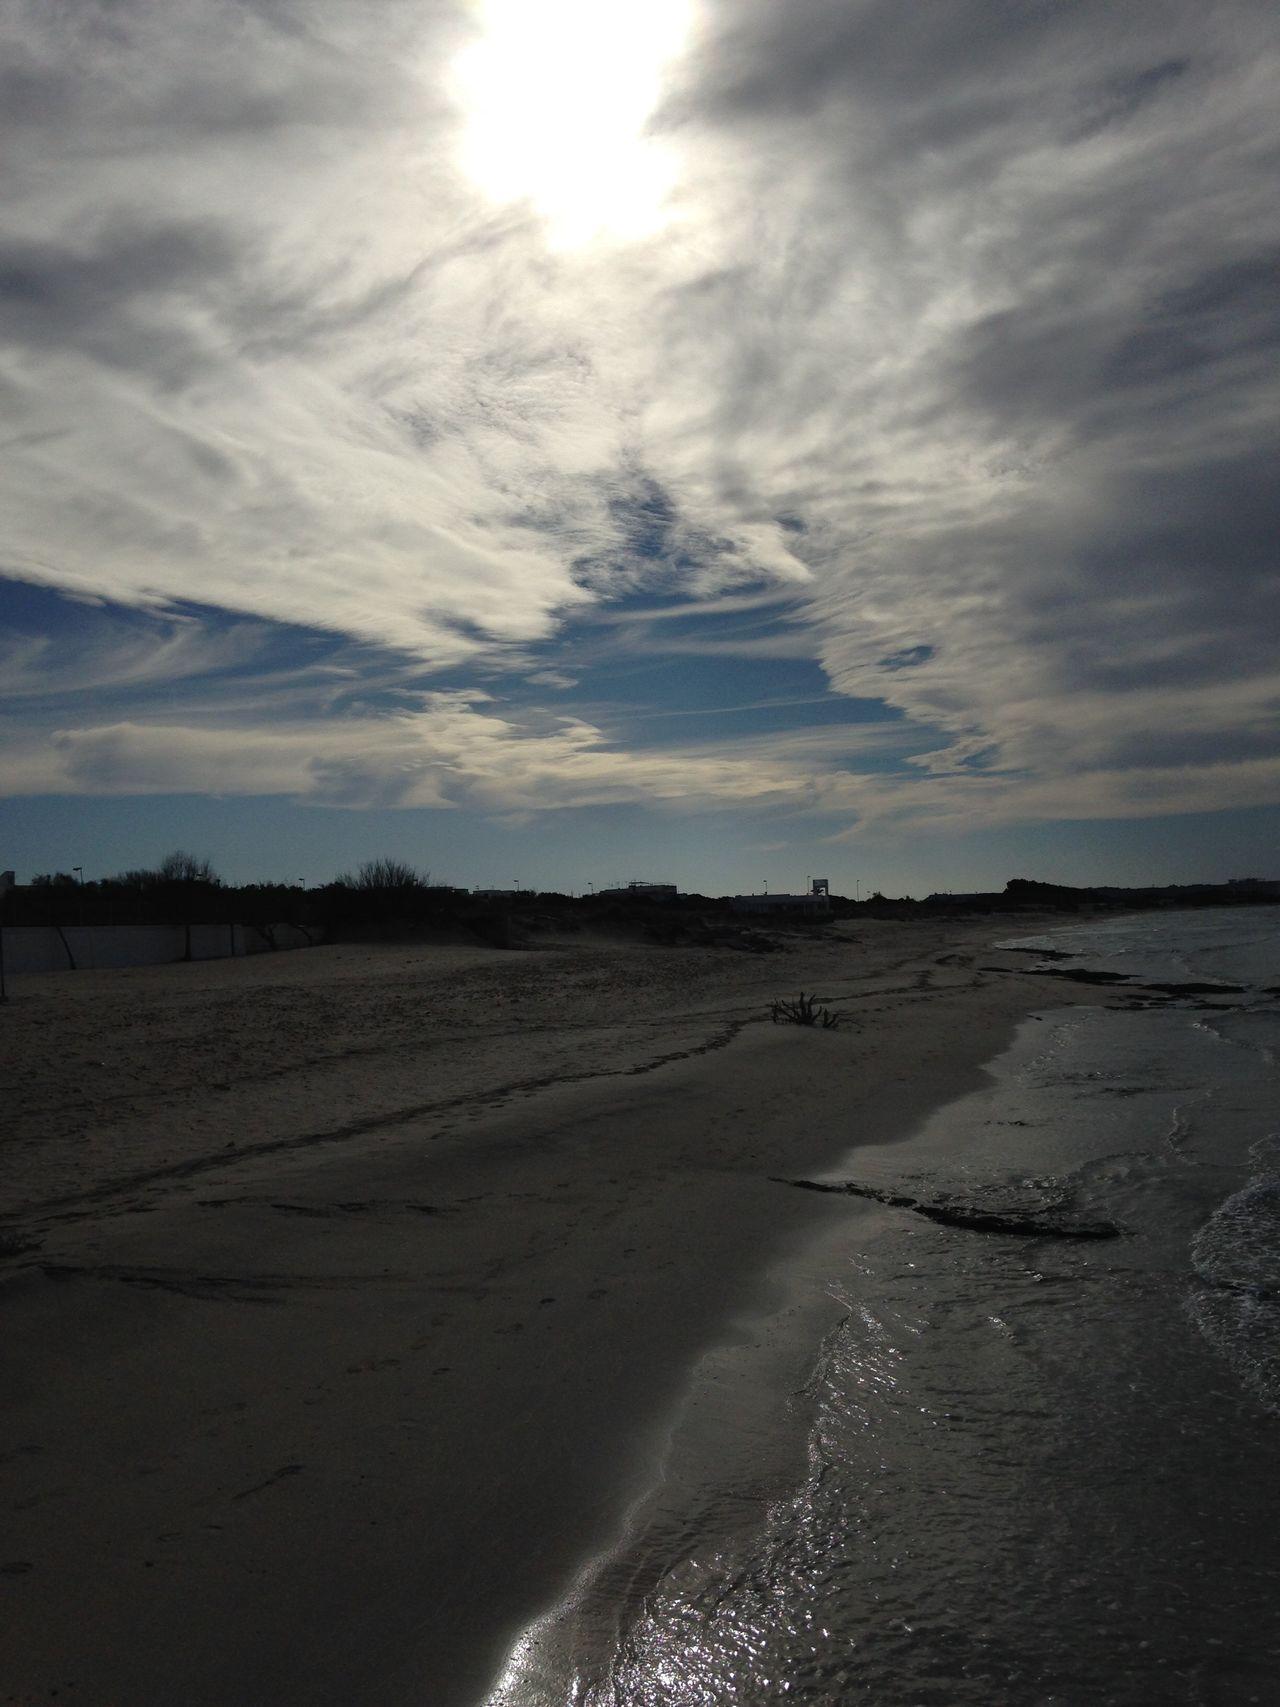 Luigi Amendola Litorale Mare Spiaggia Tempo Inverno Solitudine Sabbia Nuvole Sea Sea And Sky Sand Cloud - Sky Clouds Nature Tranquility Beach Beauty In Nature Landscape Day Winter Seascape Sand and nature